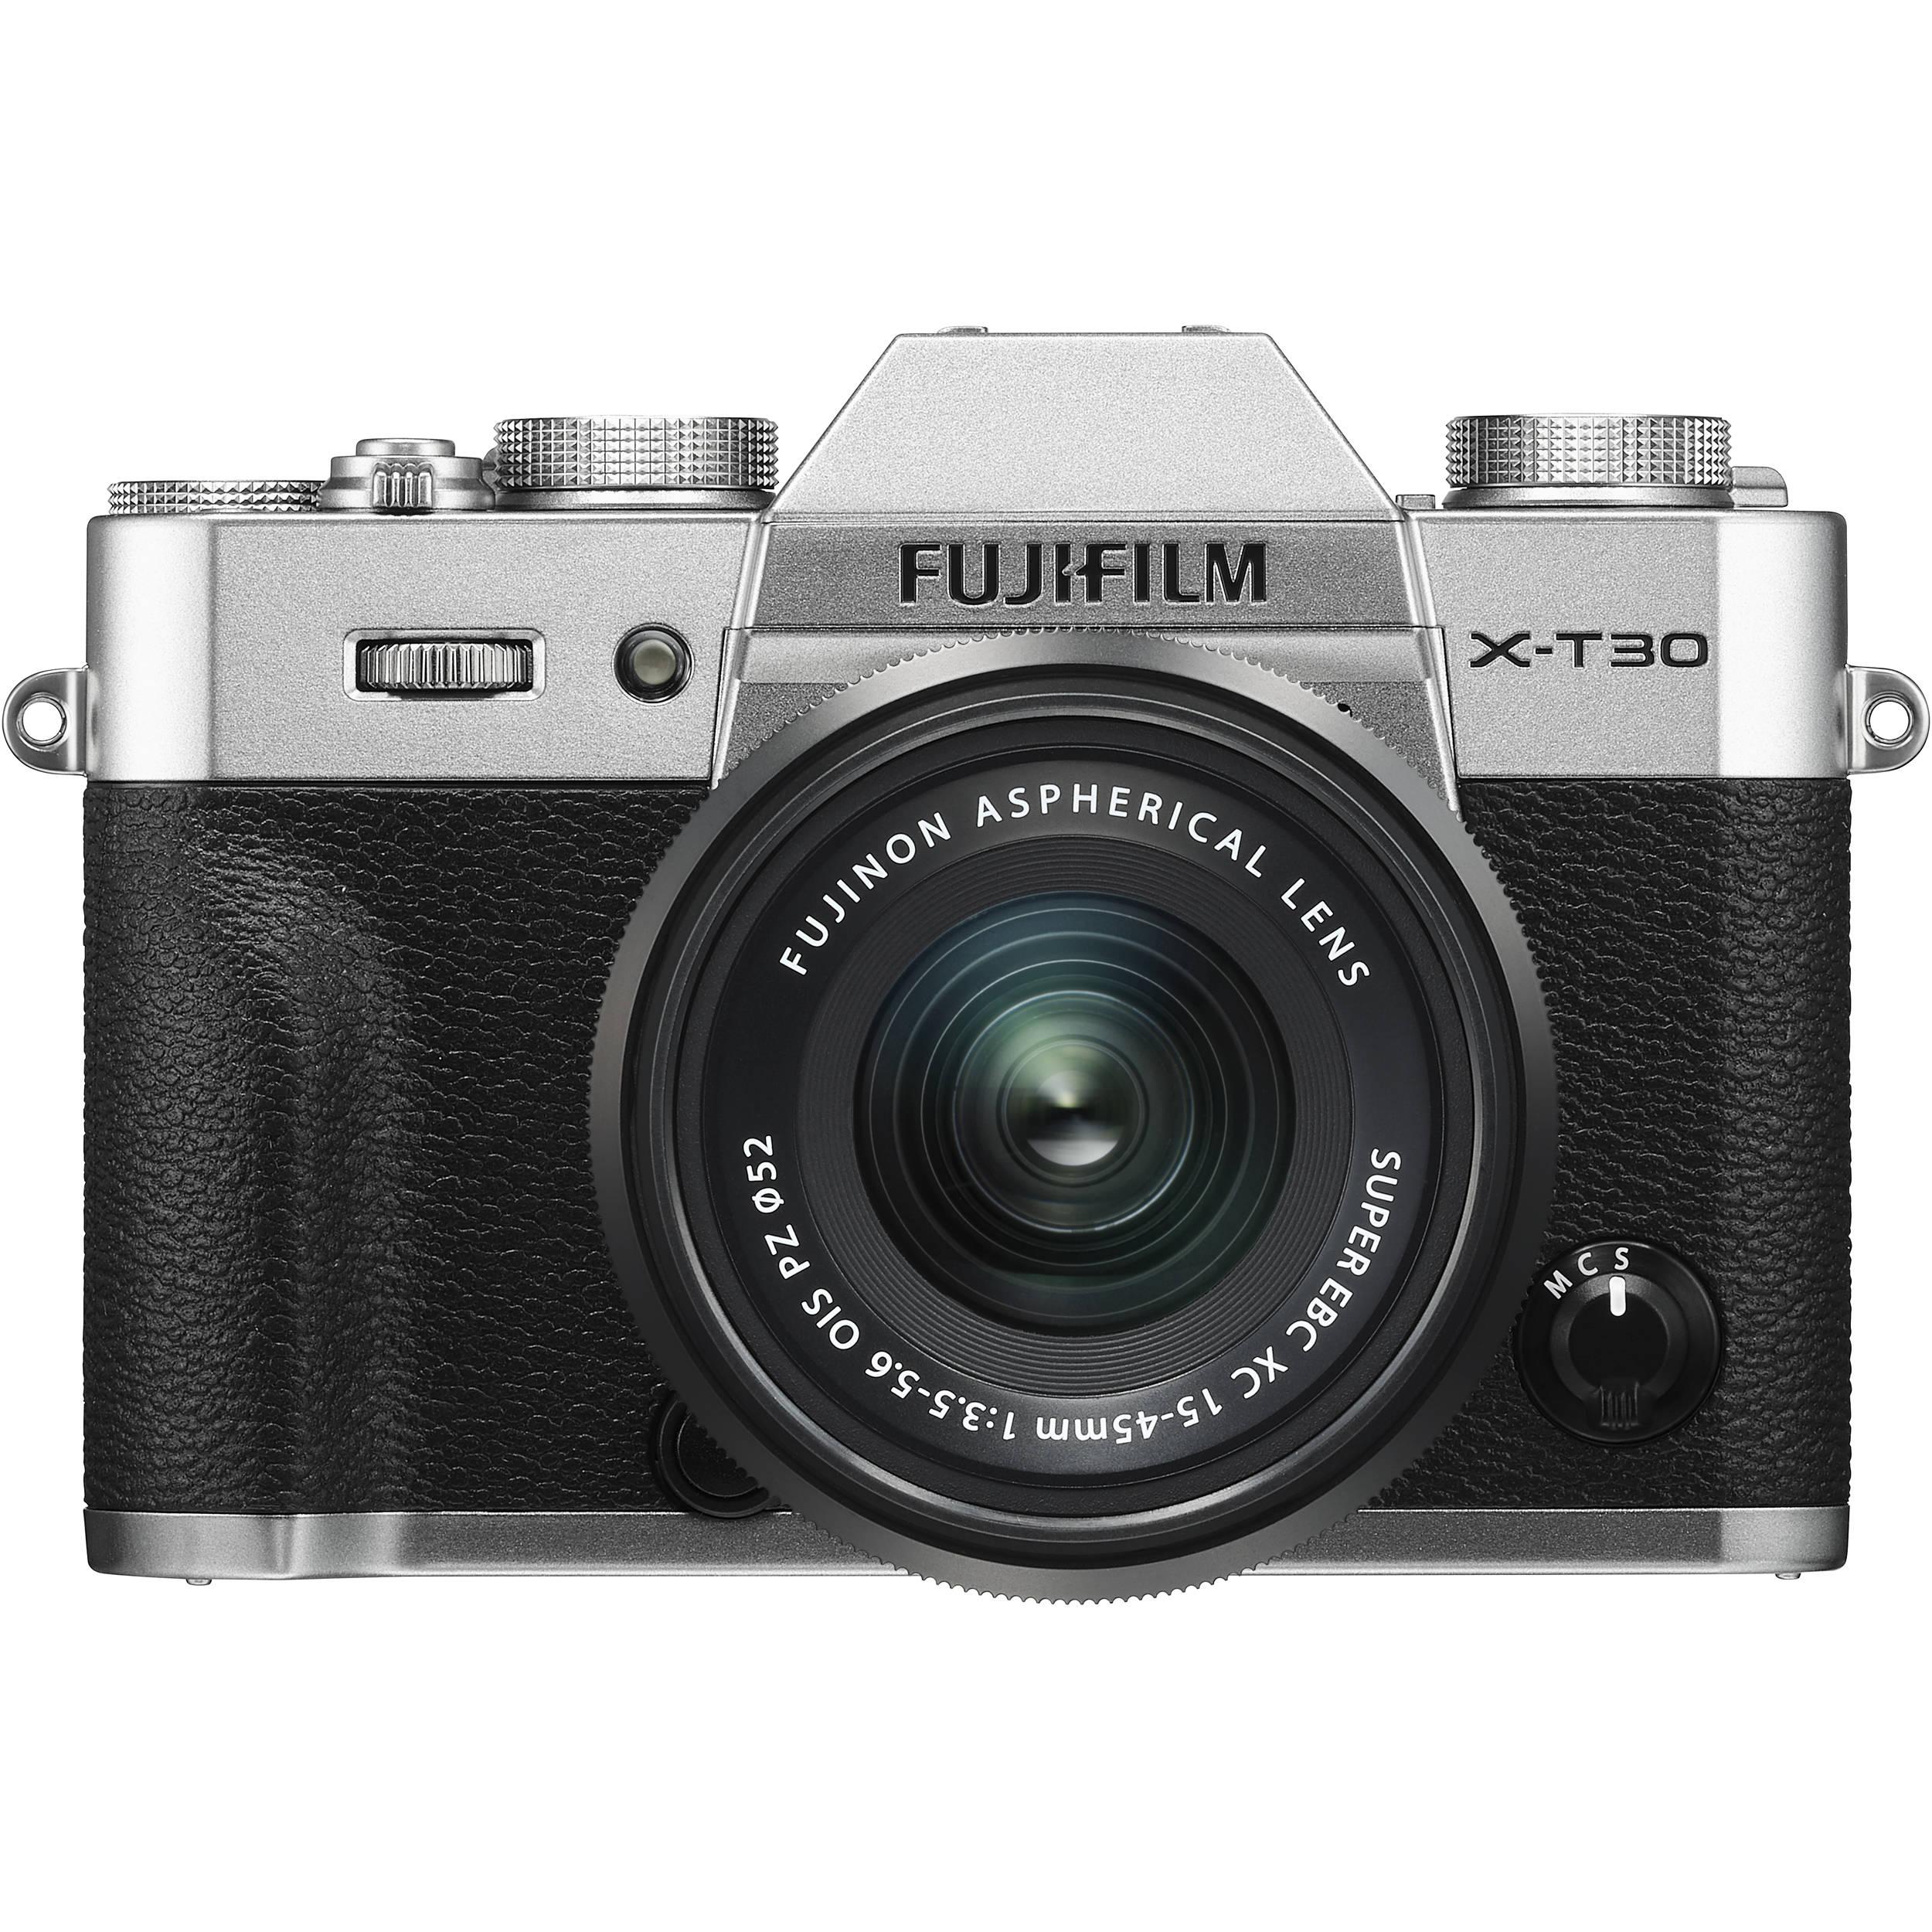 Fujifilm X-T30 Camera